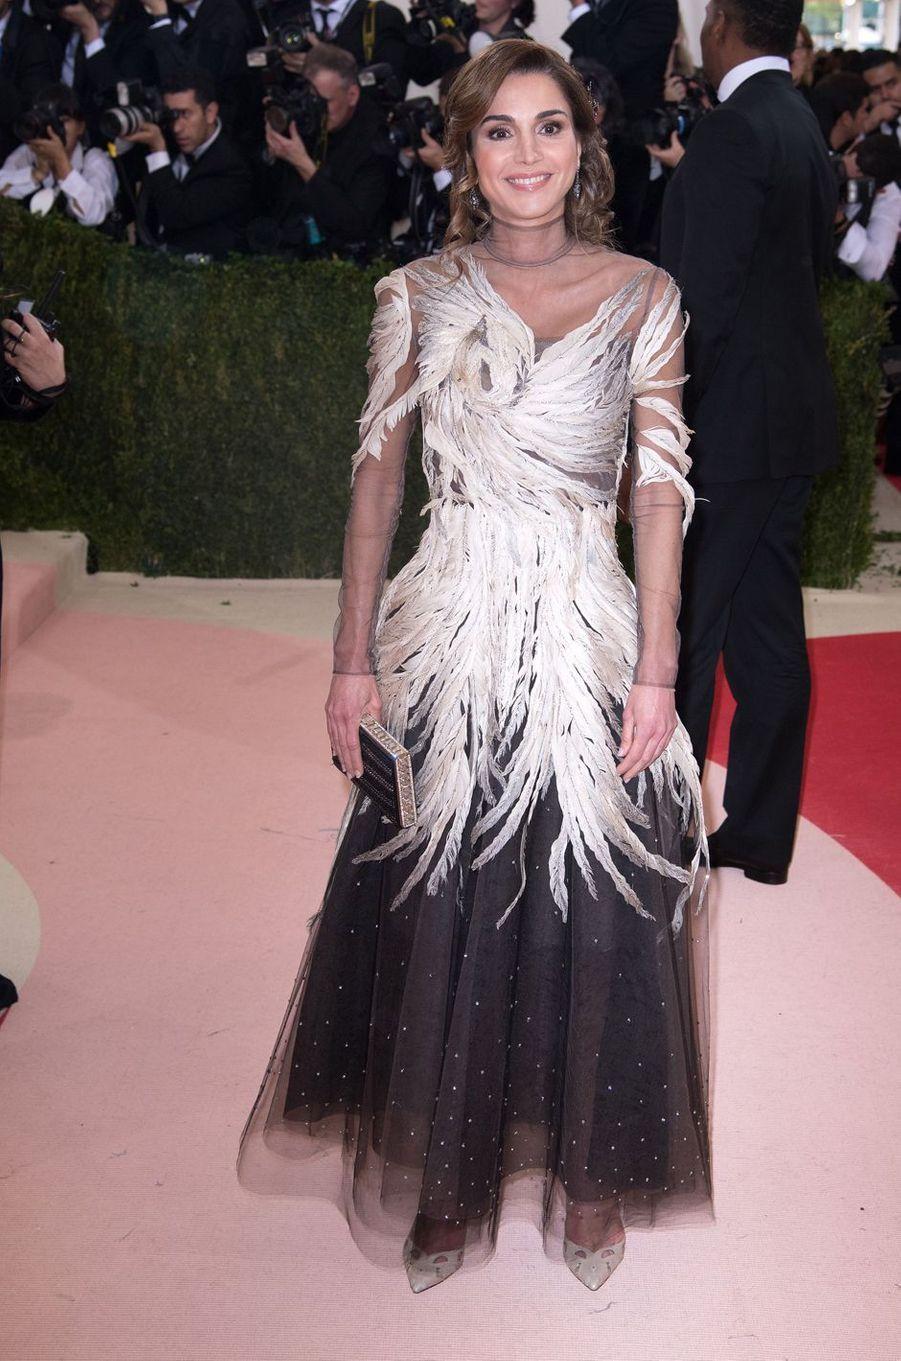 La reine Rania de Jordanie dans une robe Valentino à New York, le 2 mai 2016